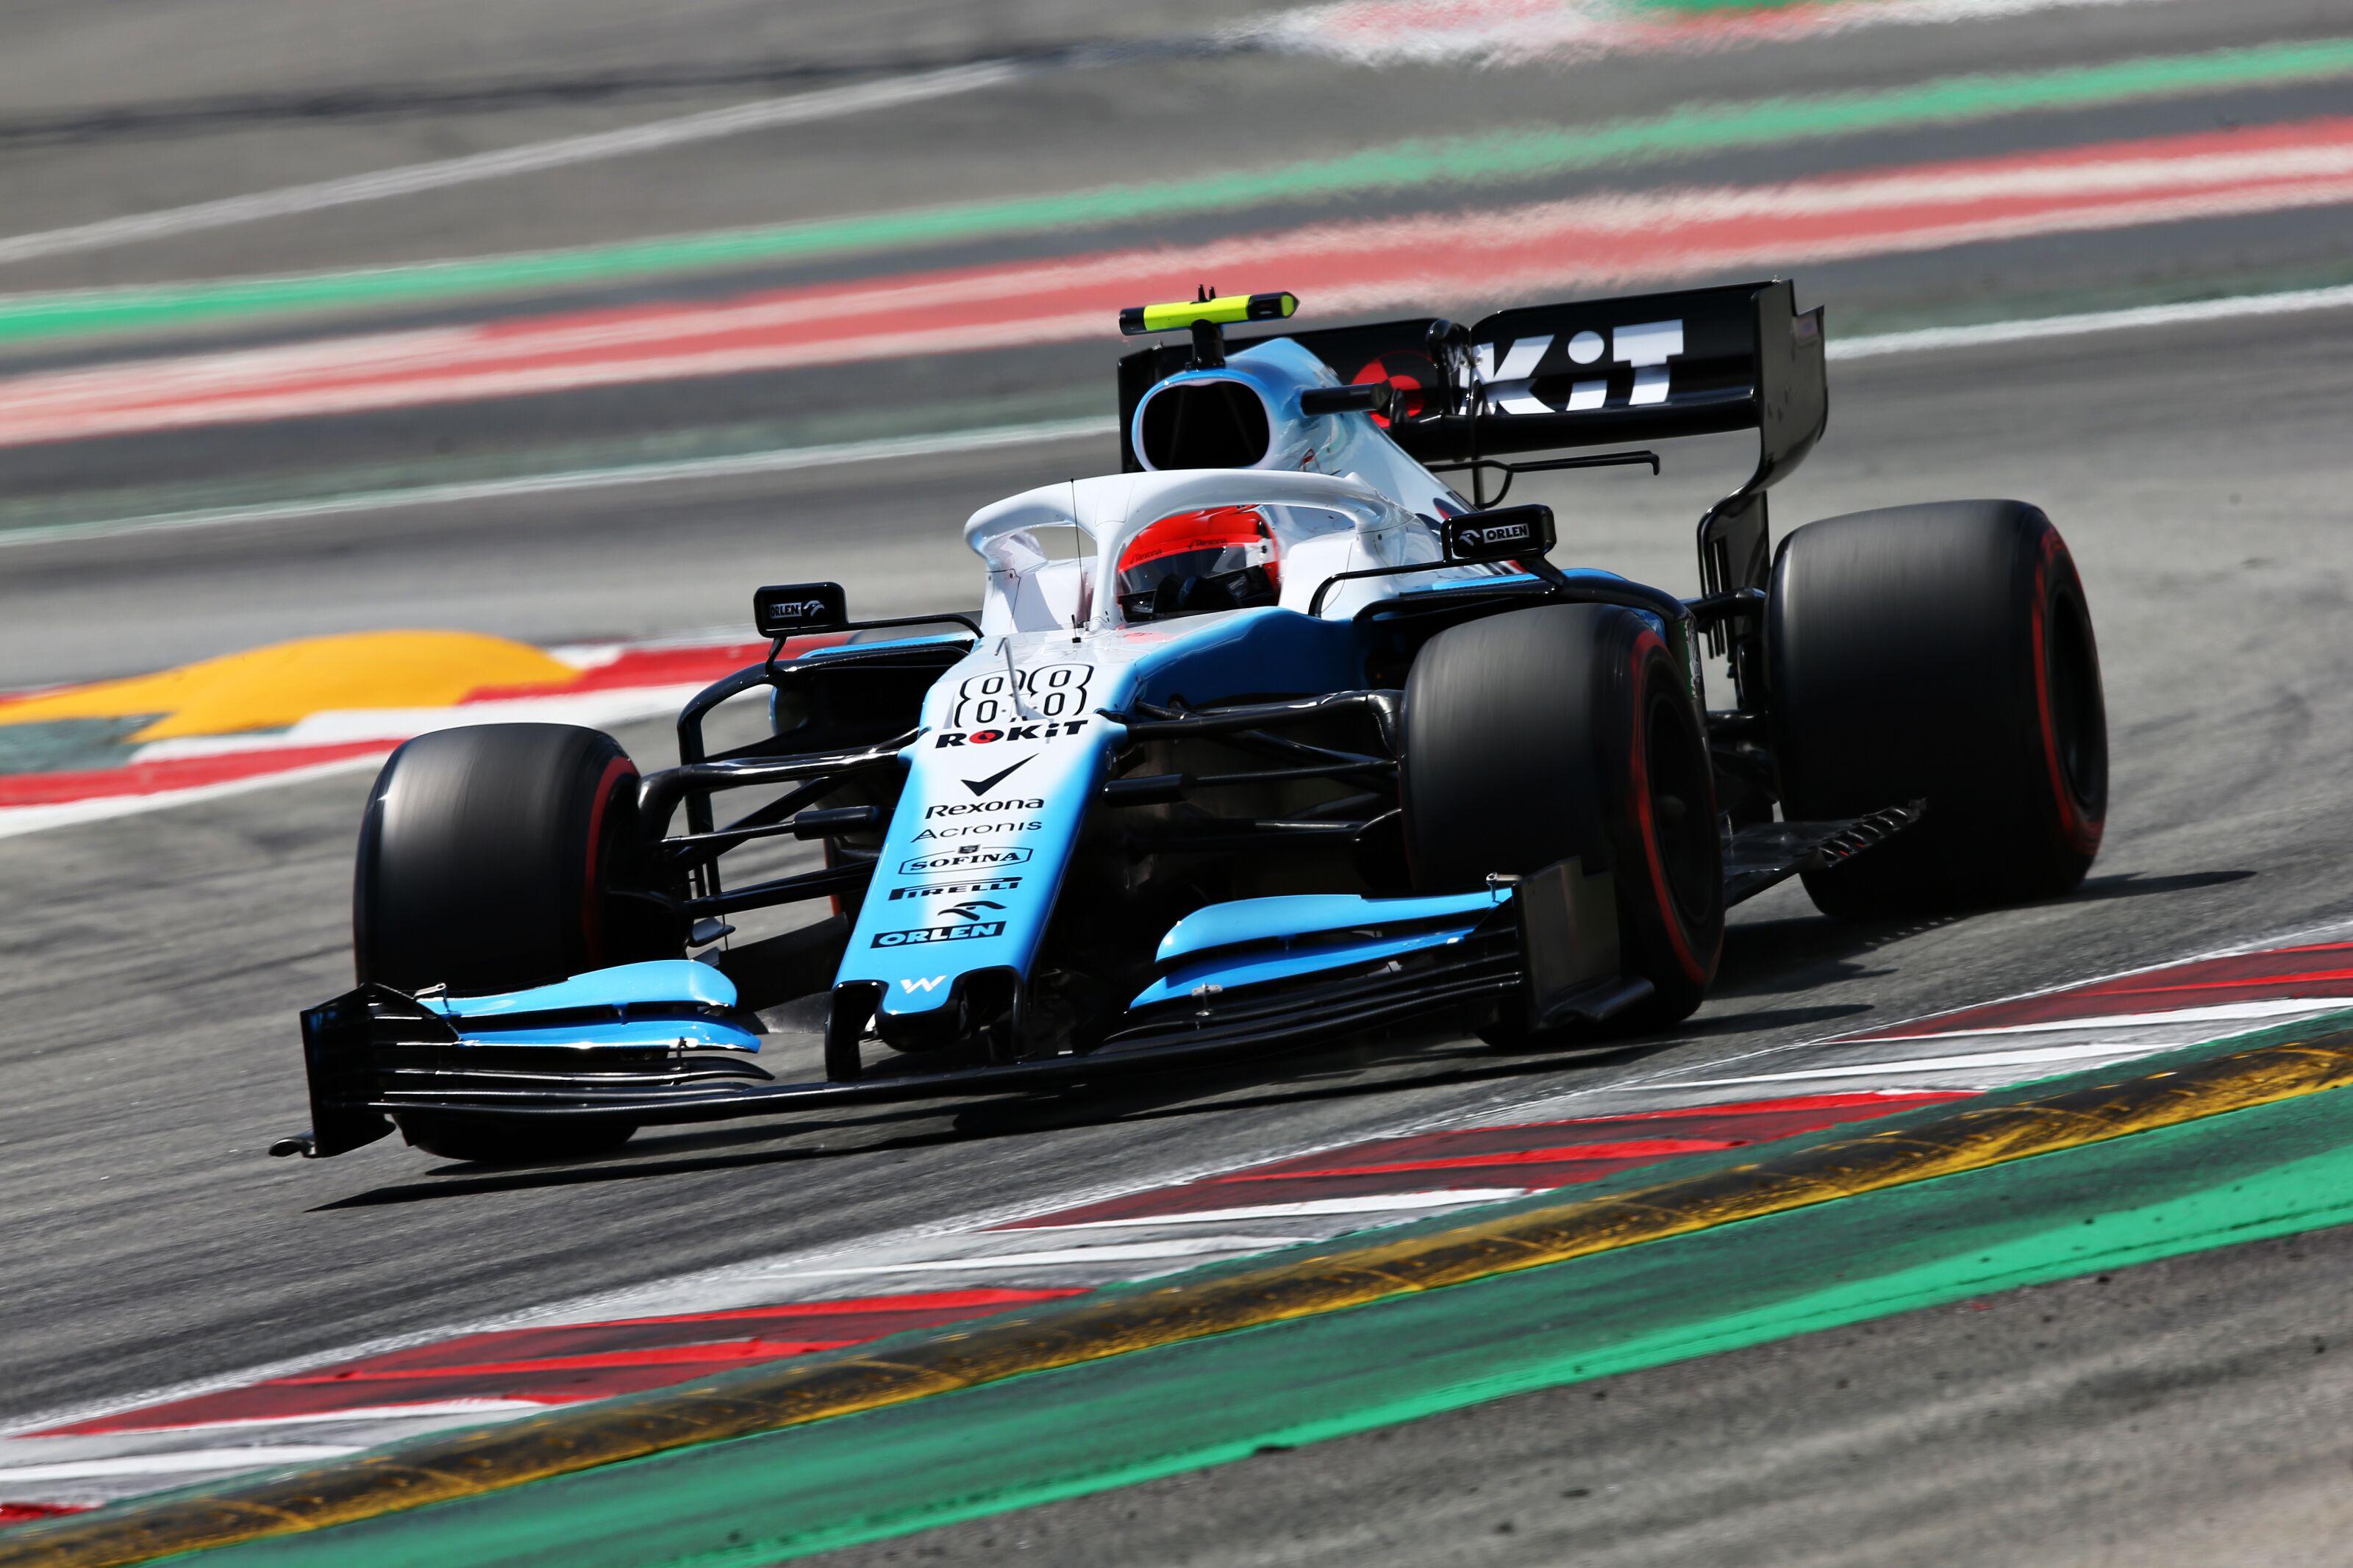 Formula 1: Should Williams replace Robert Kubica?